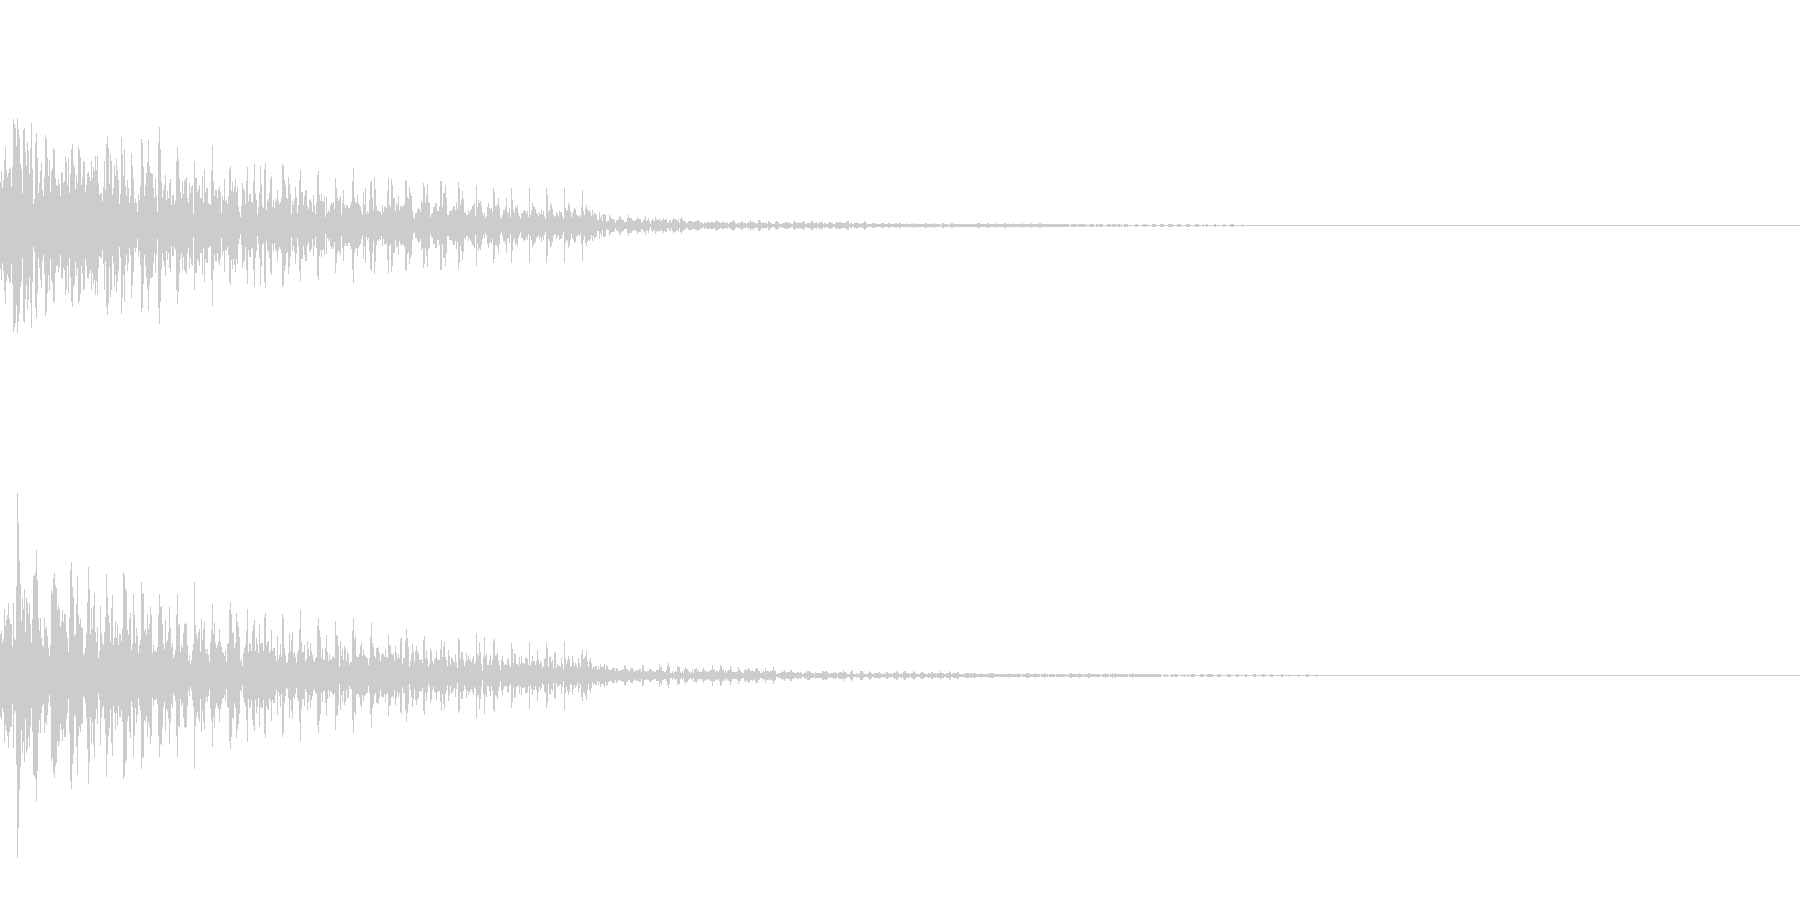 【SE 効果音】停止音の未再生の波形